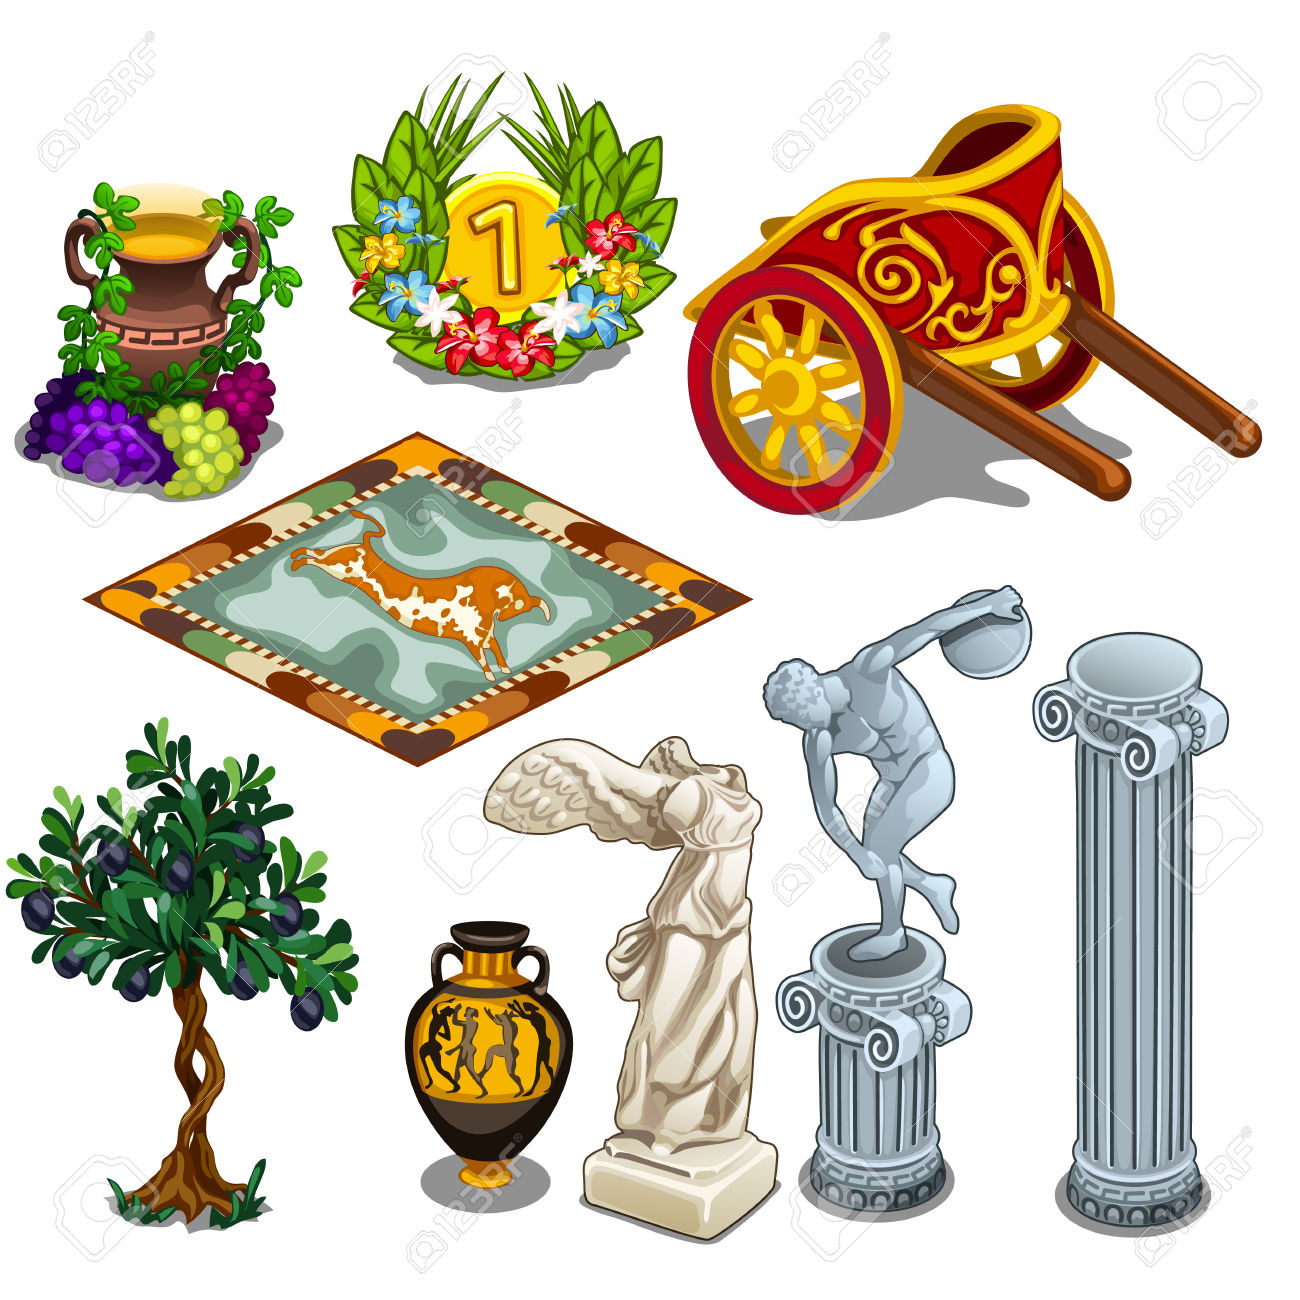 Greek Statues And Other Symbols Of Ancient Culture. Big Vector.